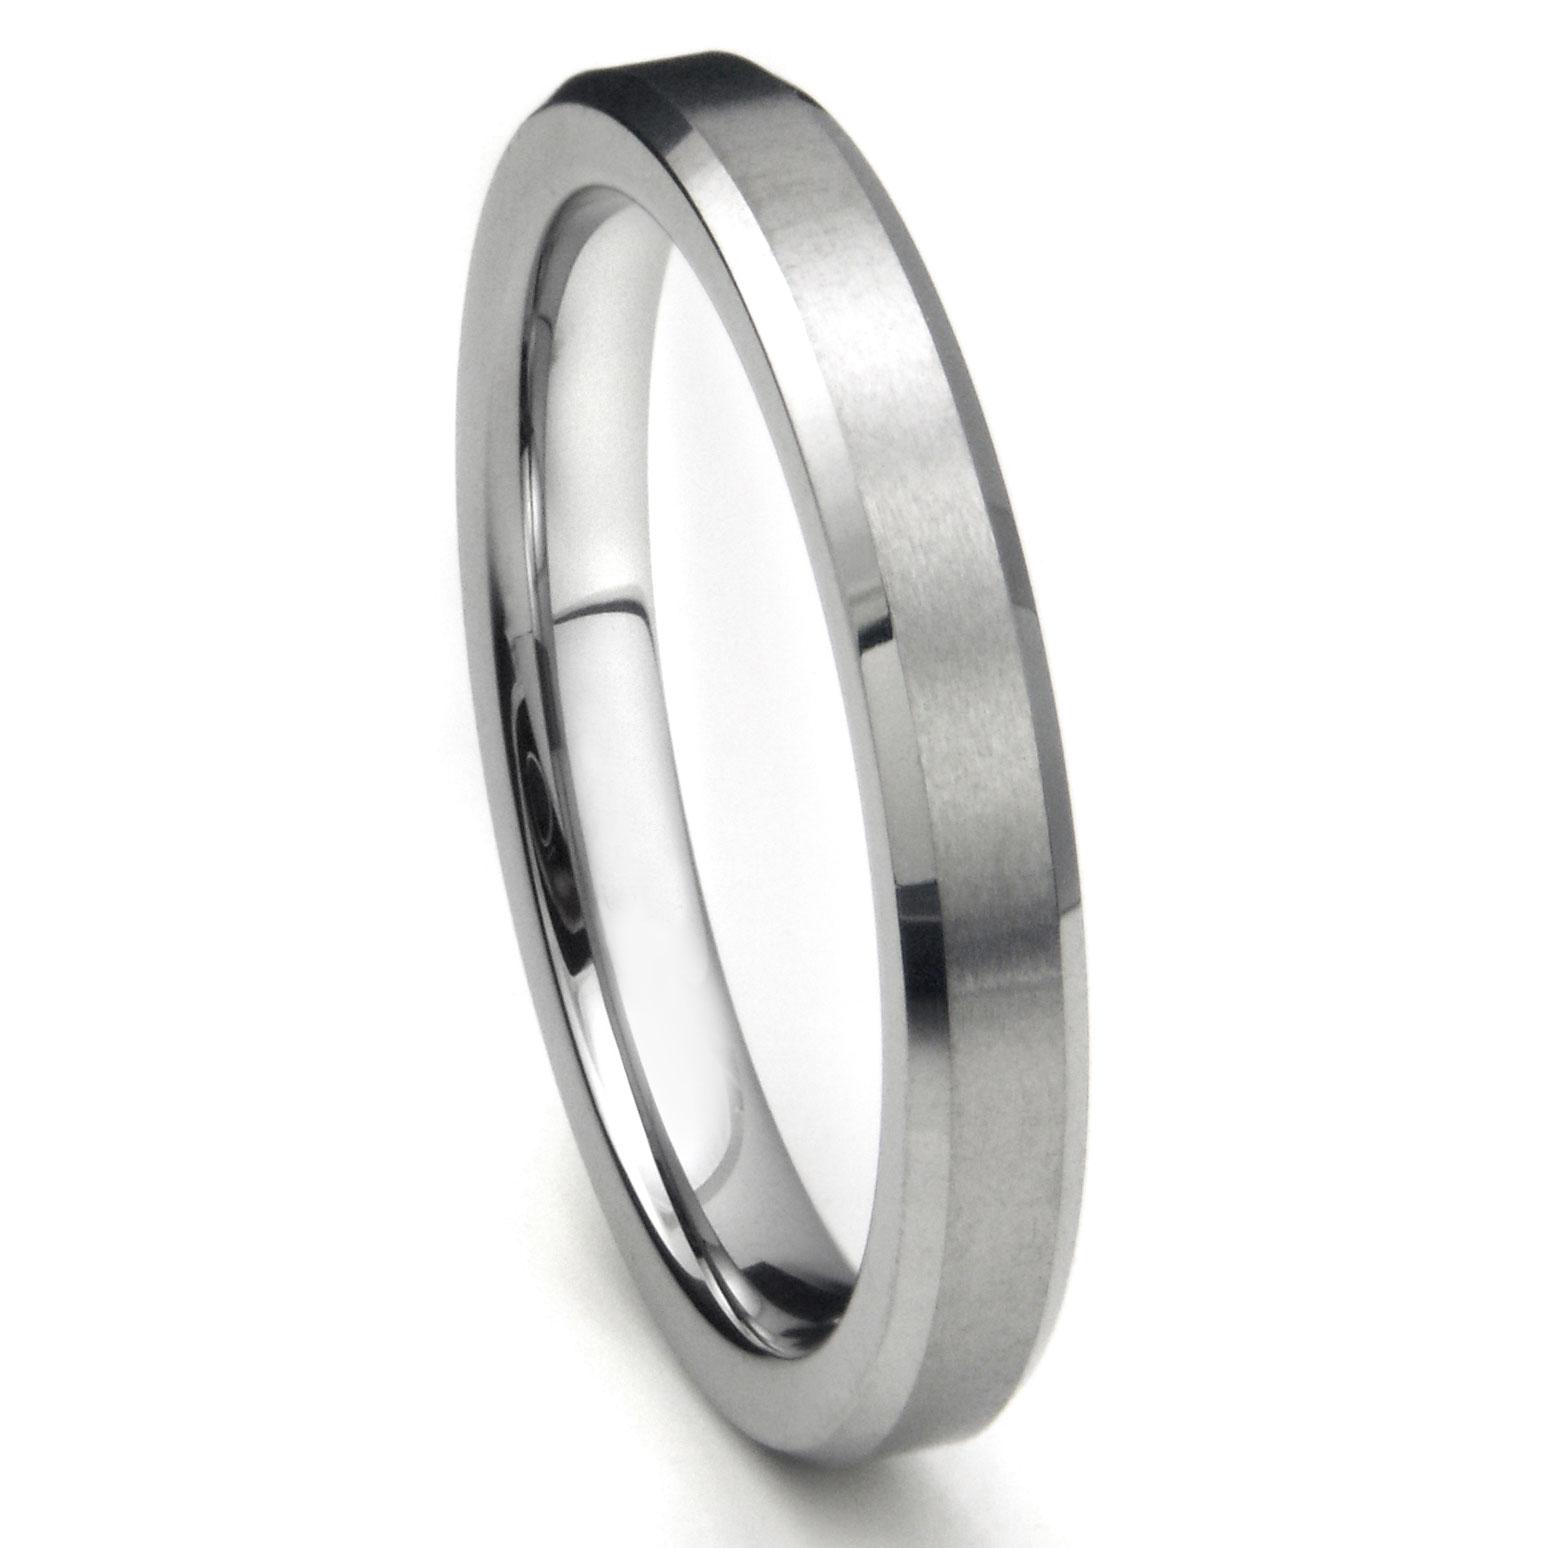 Tungsten Carbide 4MM Beveled Brush Finish Wedding Band Ring P tungsten carbide wedding rings Home Men s Tungsten Carbide Rings Loading zoom